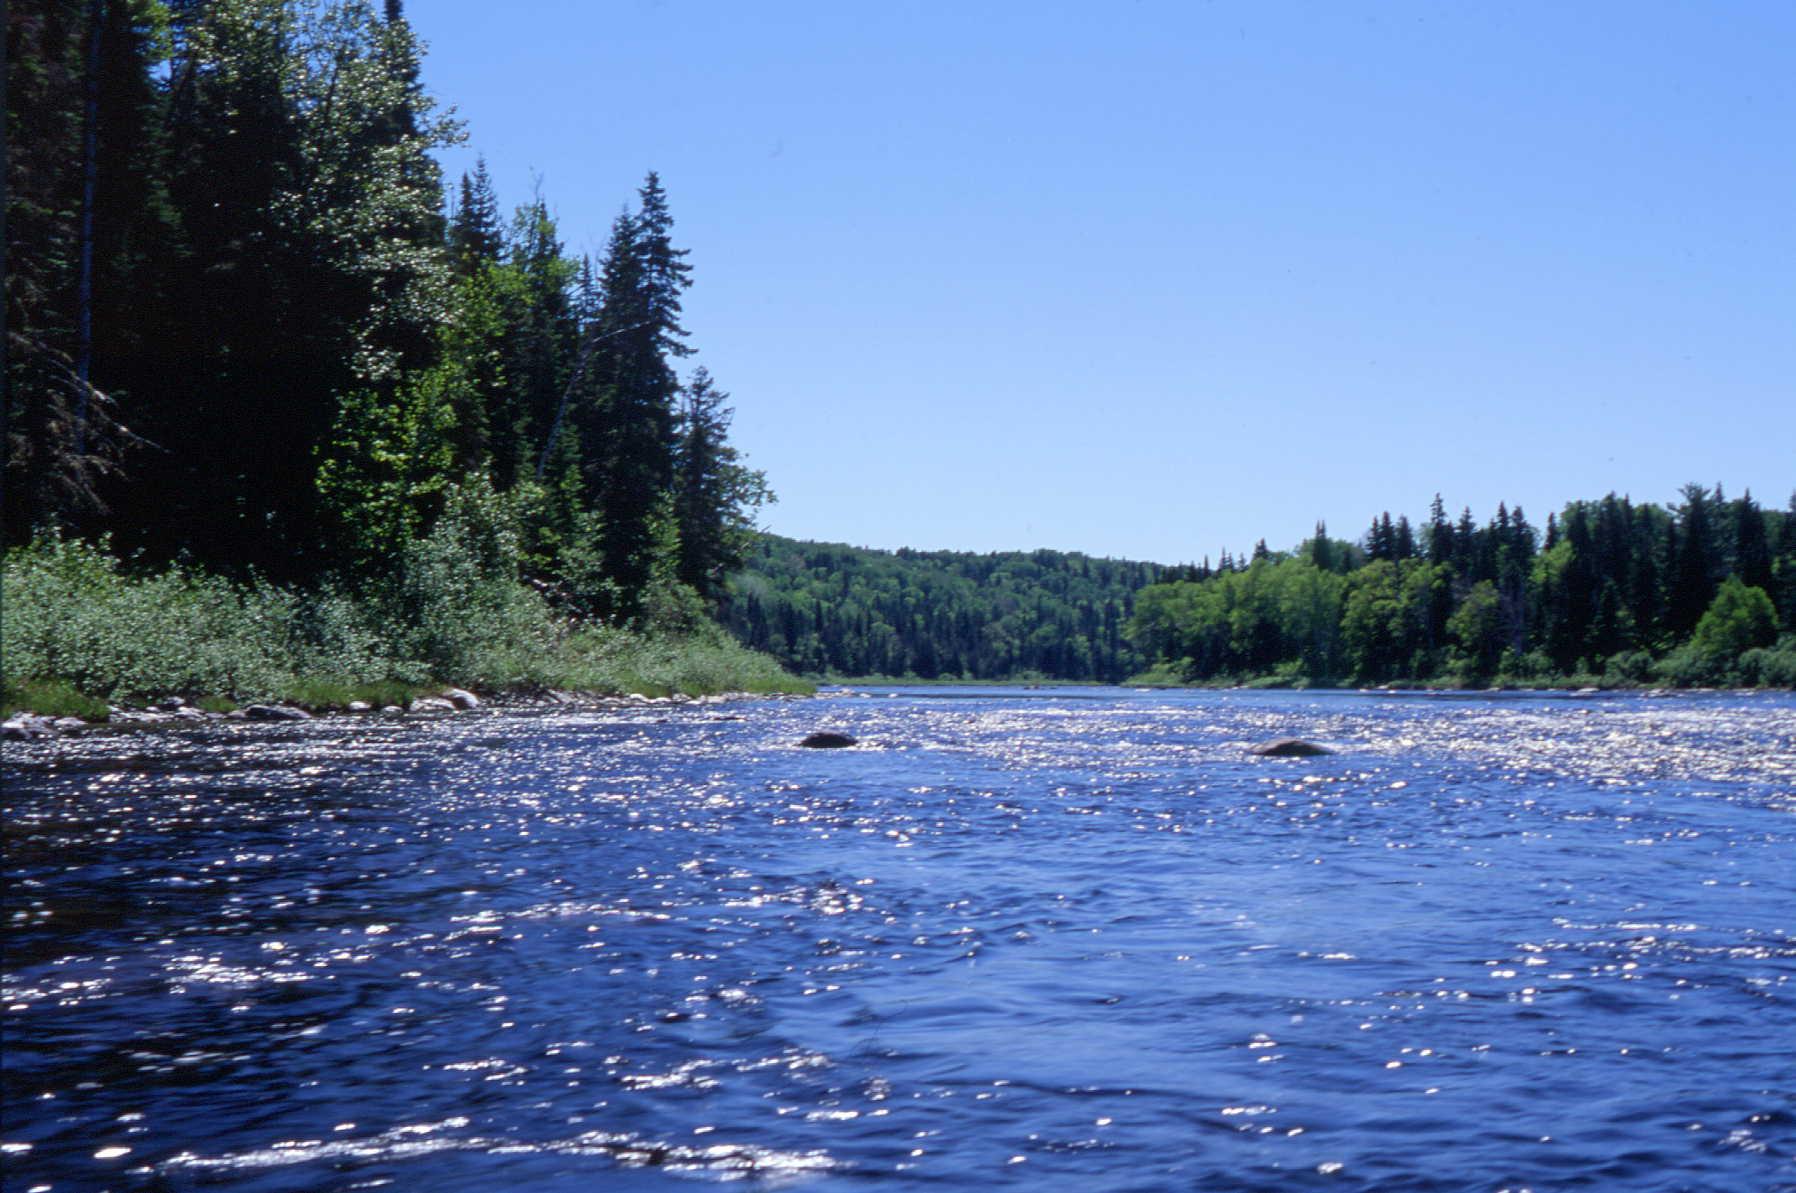 Allagash River, Maine